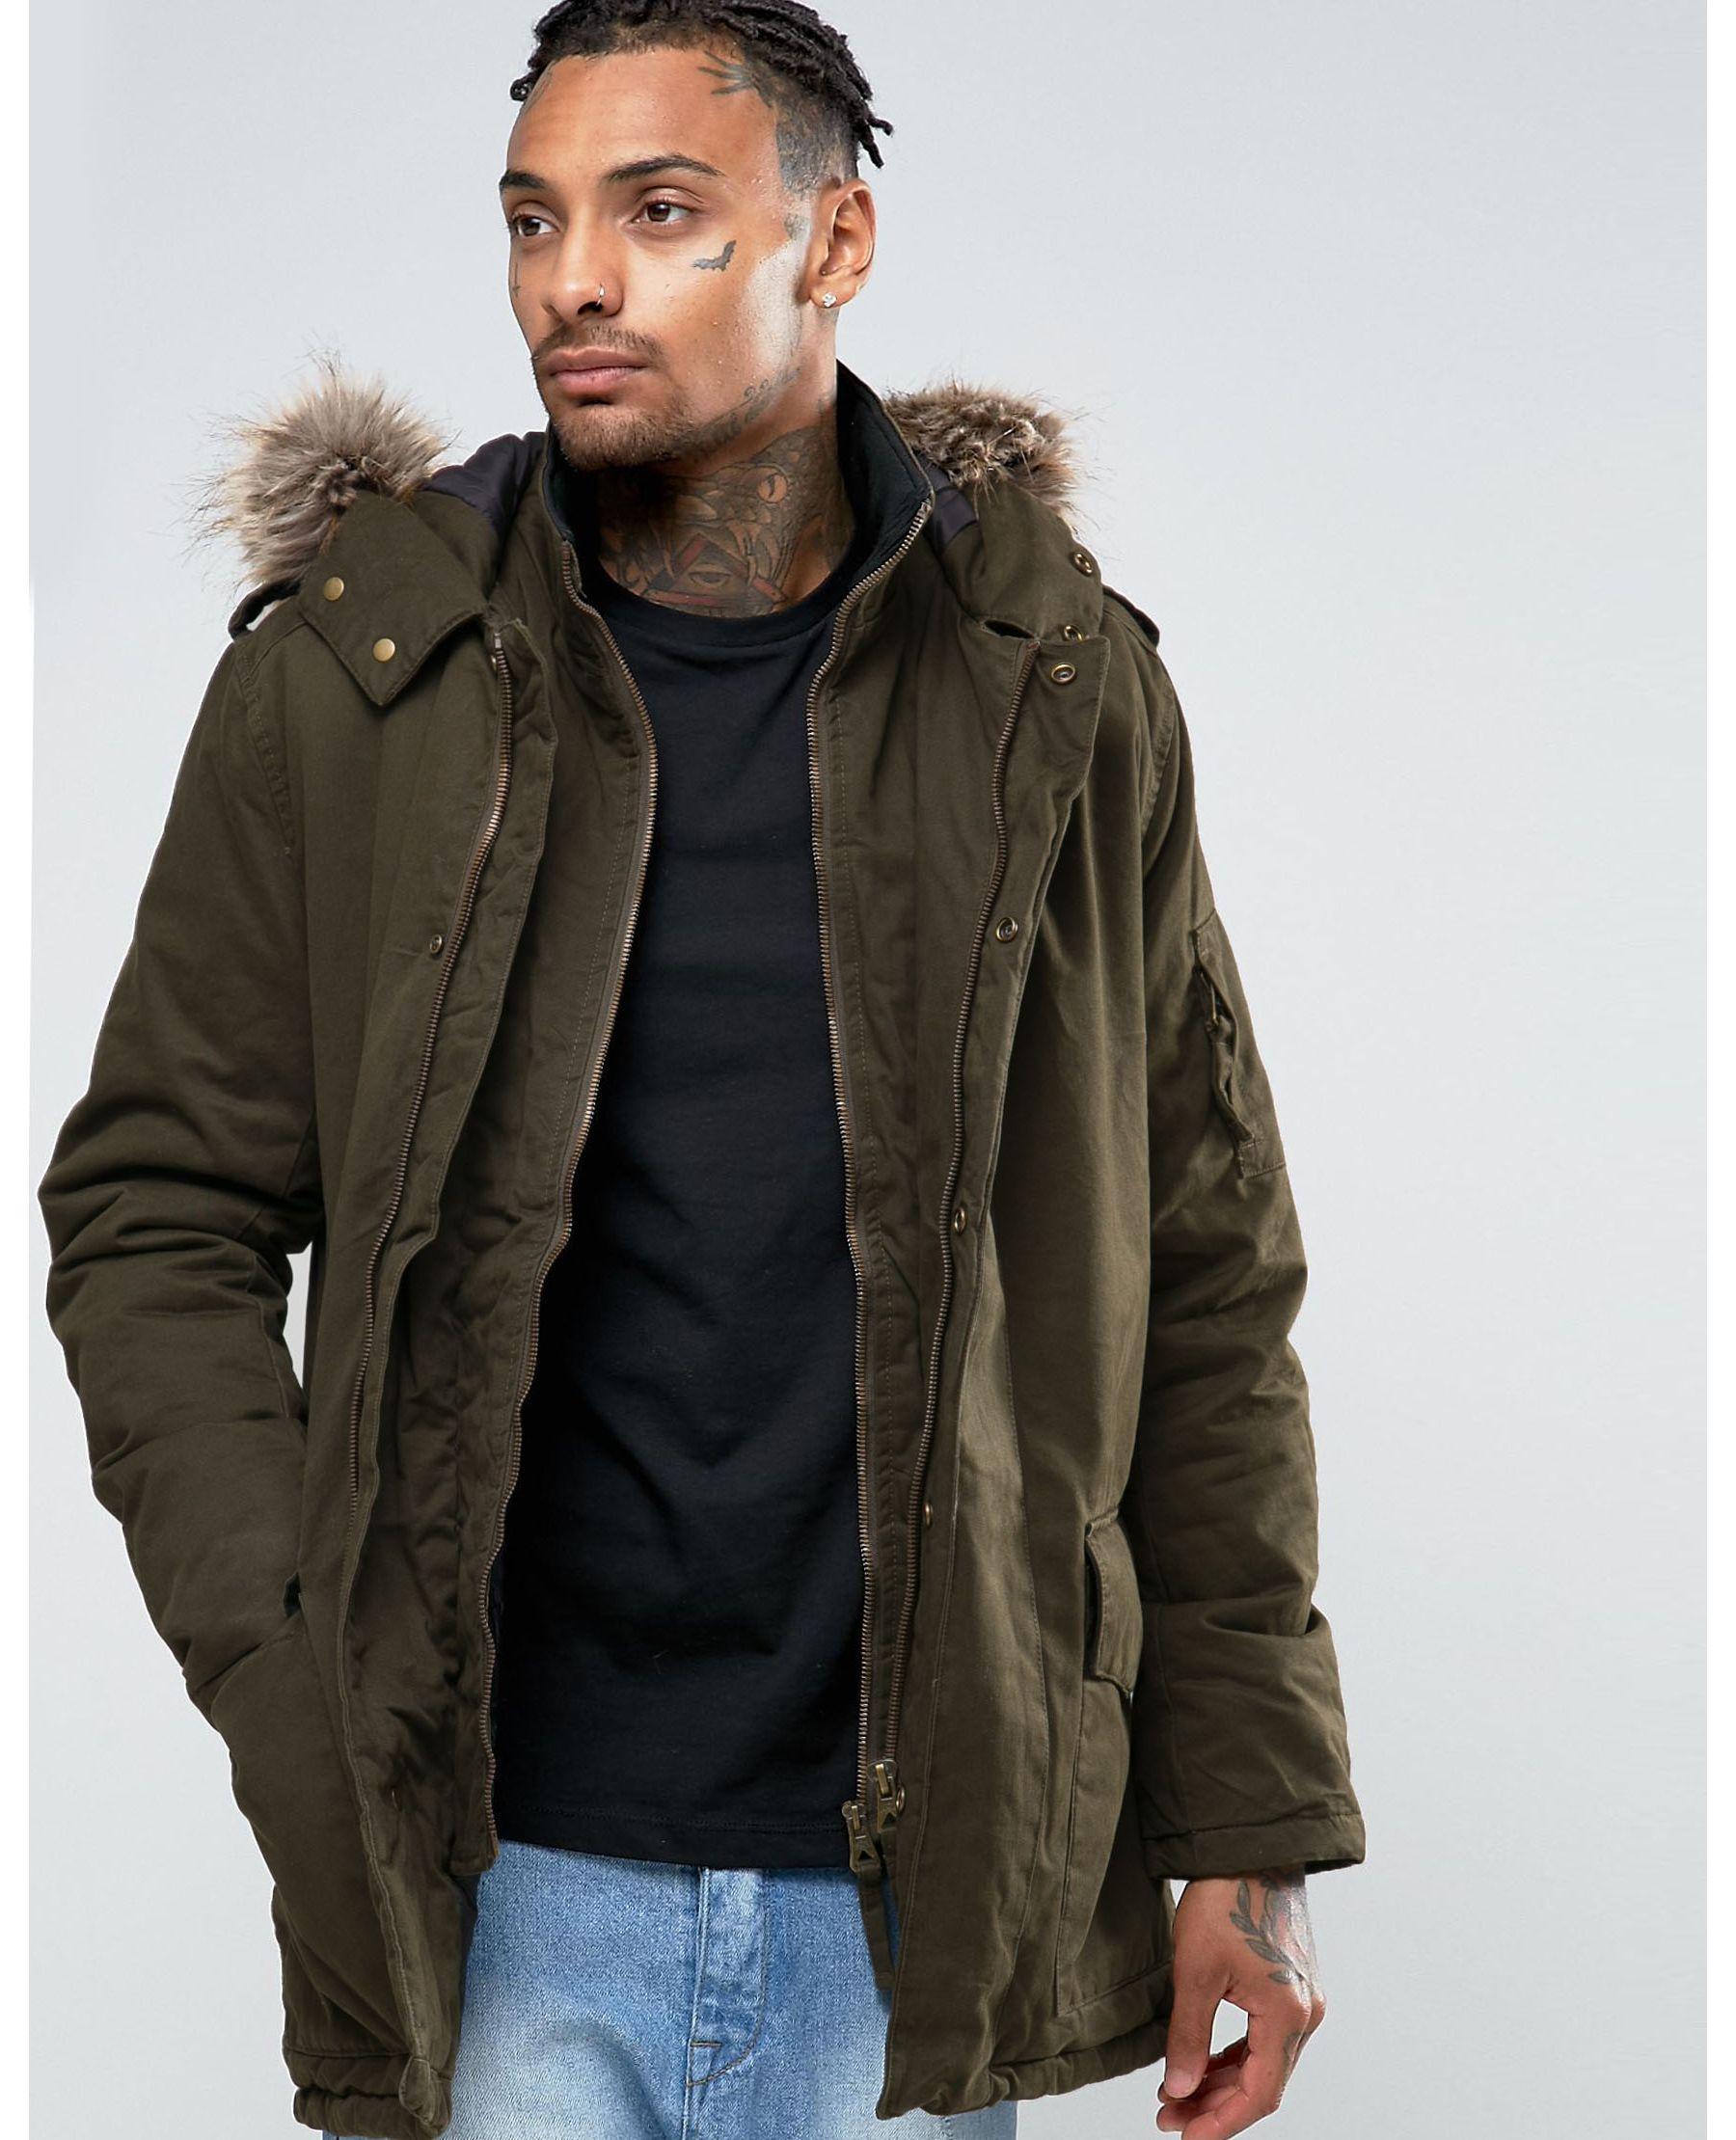 Free shipping and returns on Men's Parka Coats & Jackets at puraconga.ml